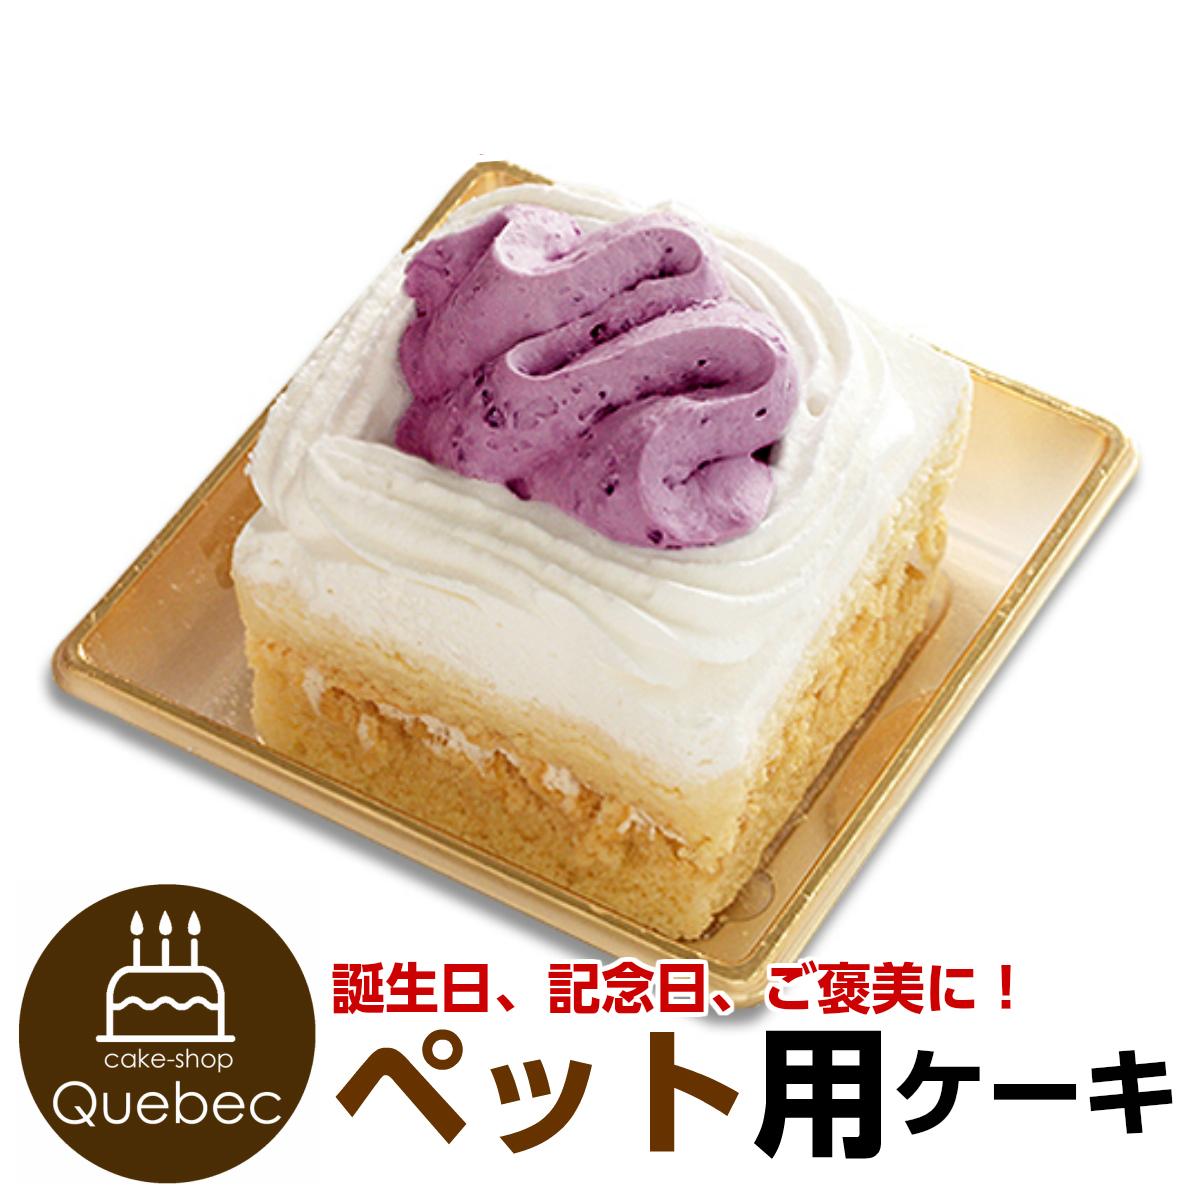 Fine Cake Shop Shortcake Pet Cake Of Rouge Potato And The Personalised Birthday Cards Veneteletsinfo